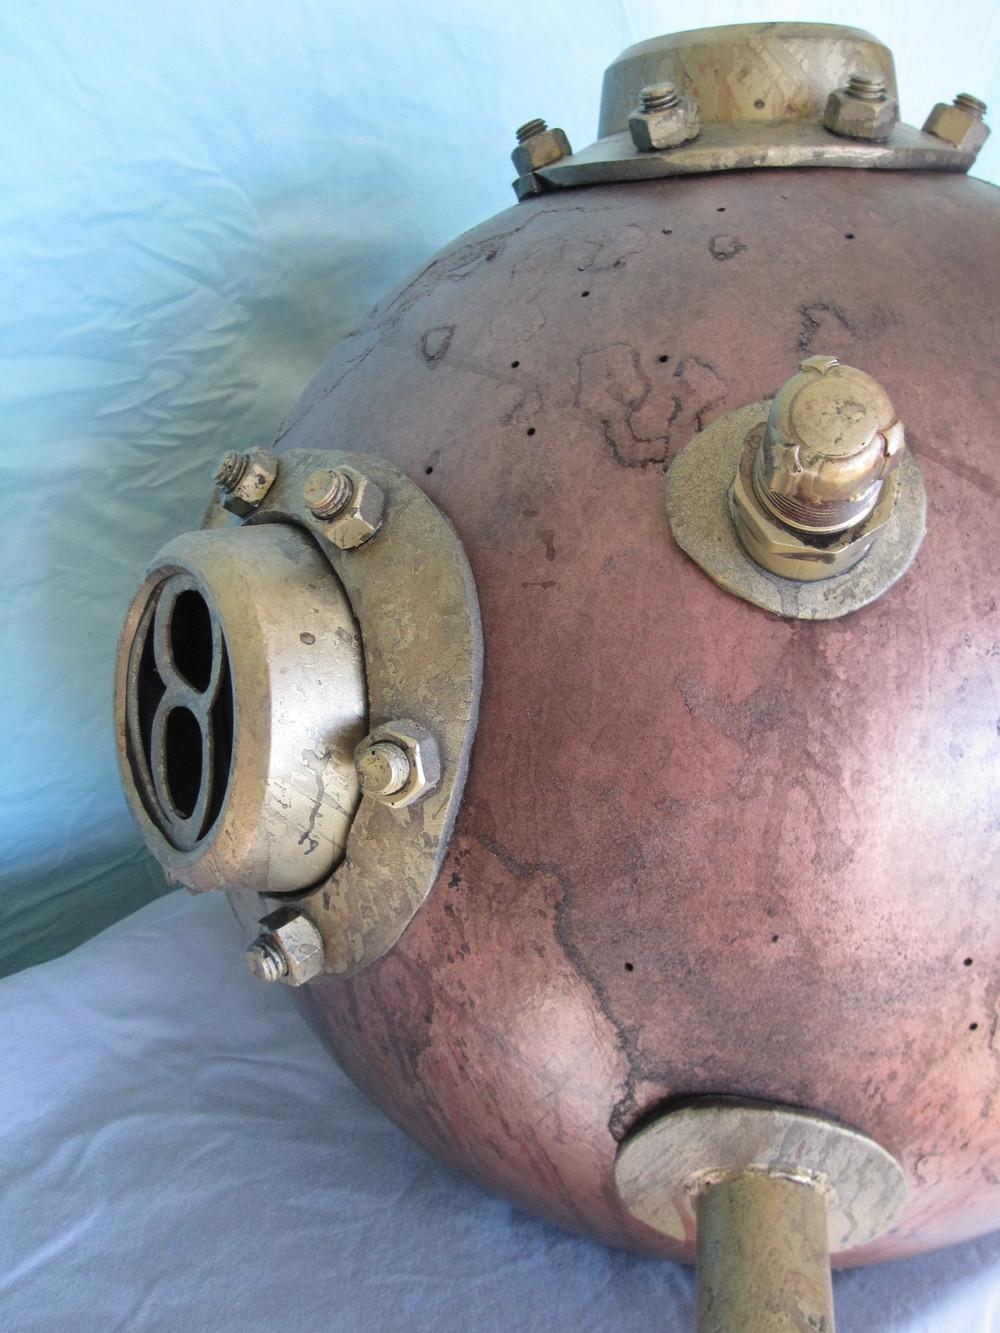 Diver Helmet Image 09.JPG